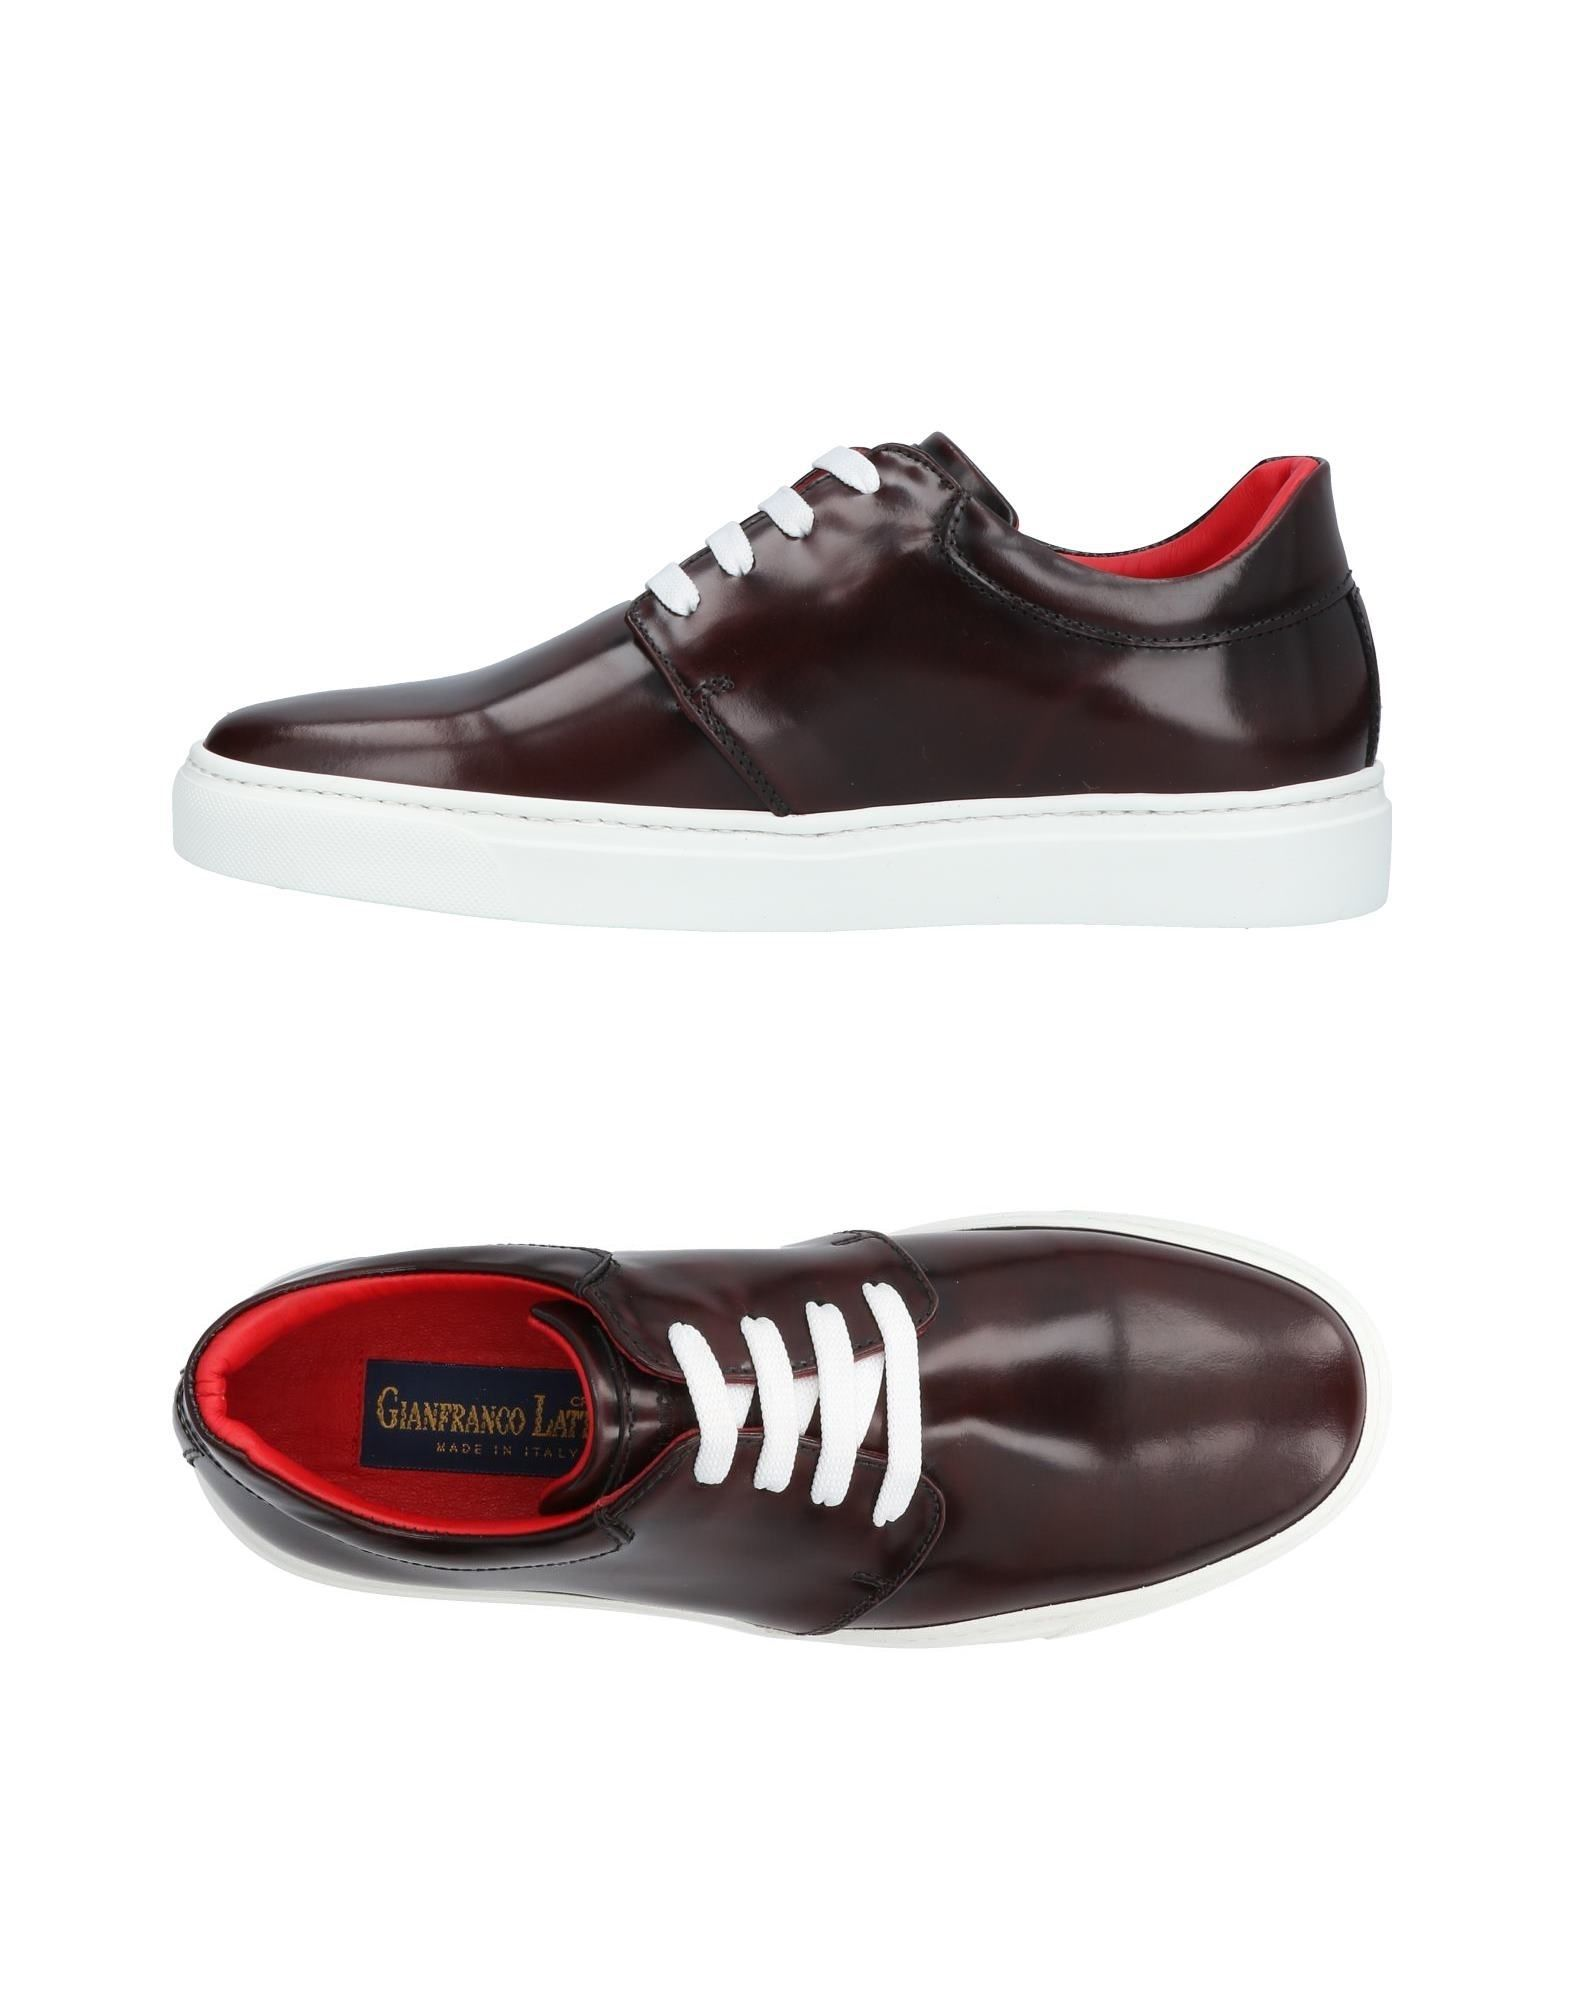 Gianfranco Lattanzi Sneakers Damen  11430239KN Gute Qualität beliebte Schuhe